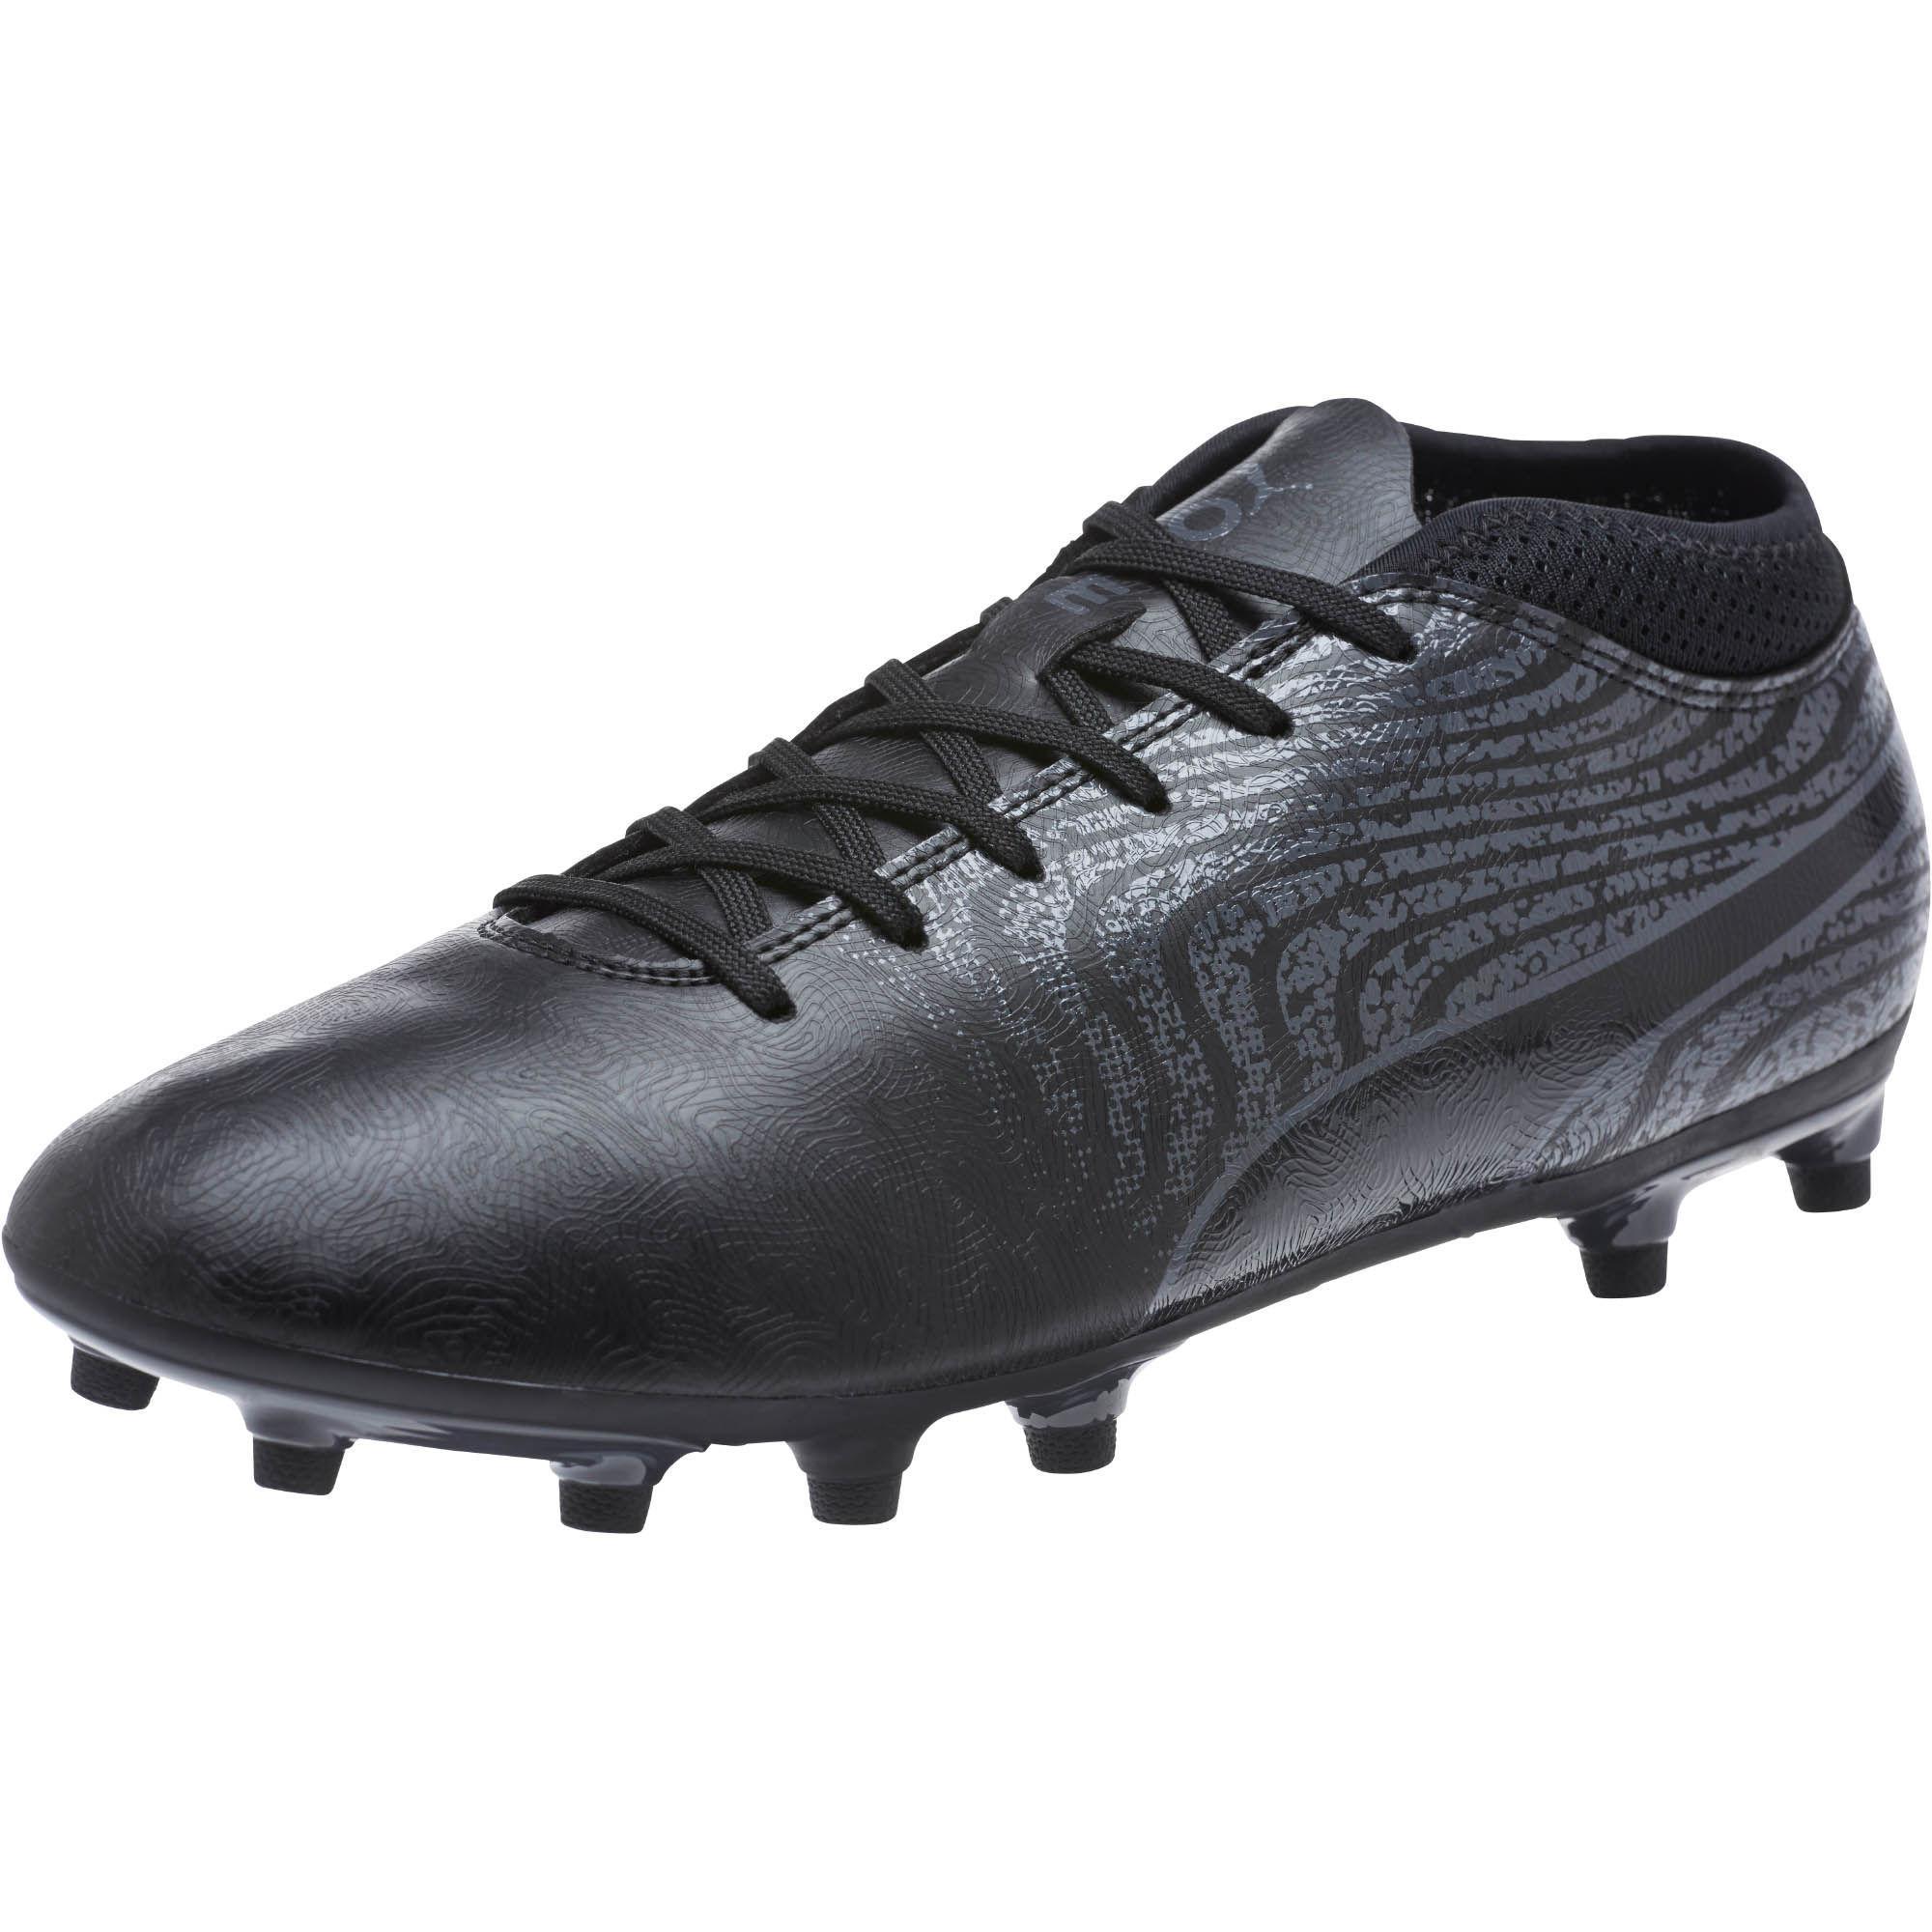 b7c050dee ... italy puma. black one 18.4 fg mens soccer cleats b7717 a9ac1